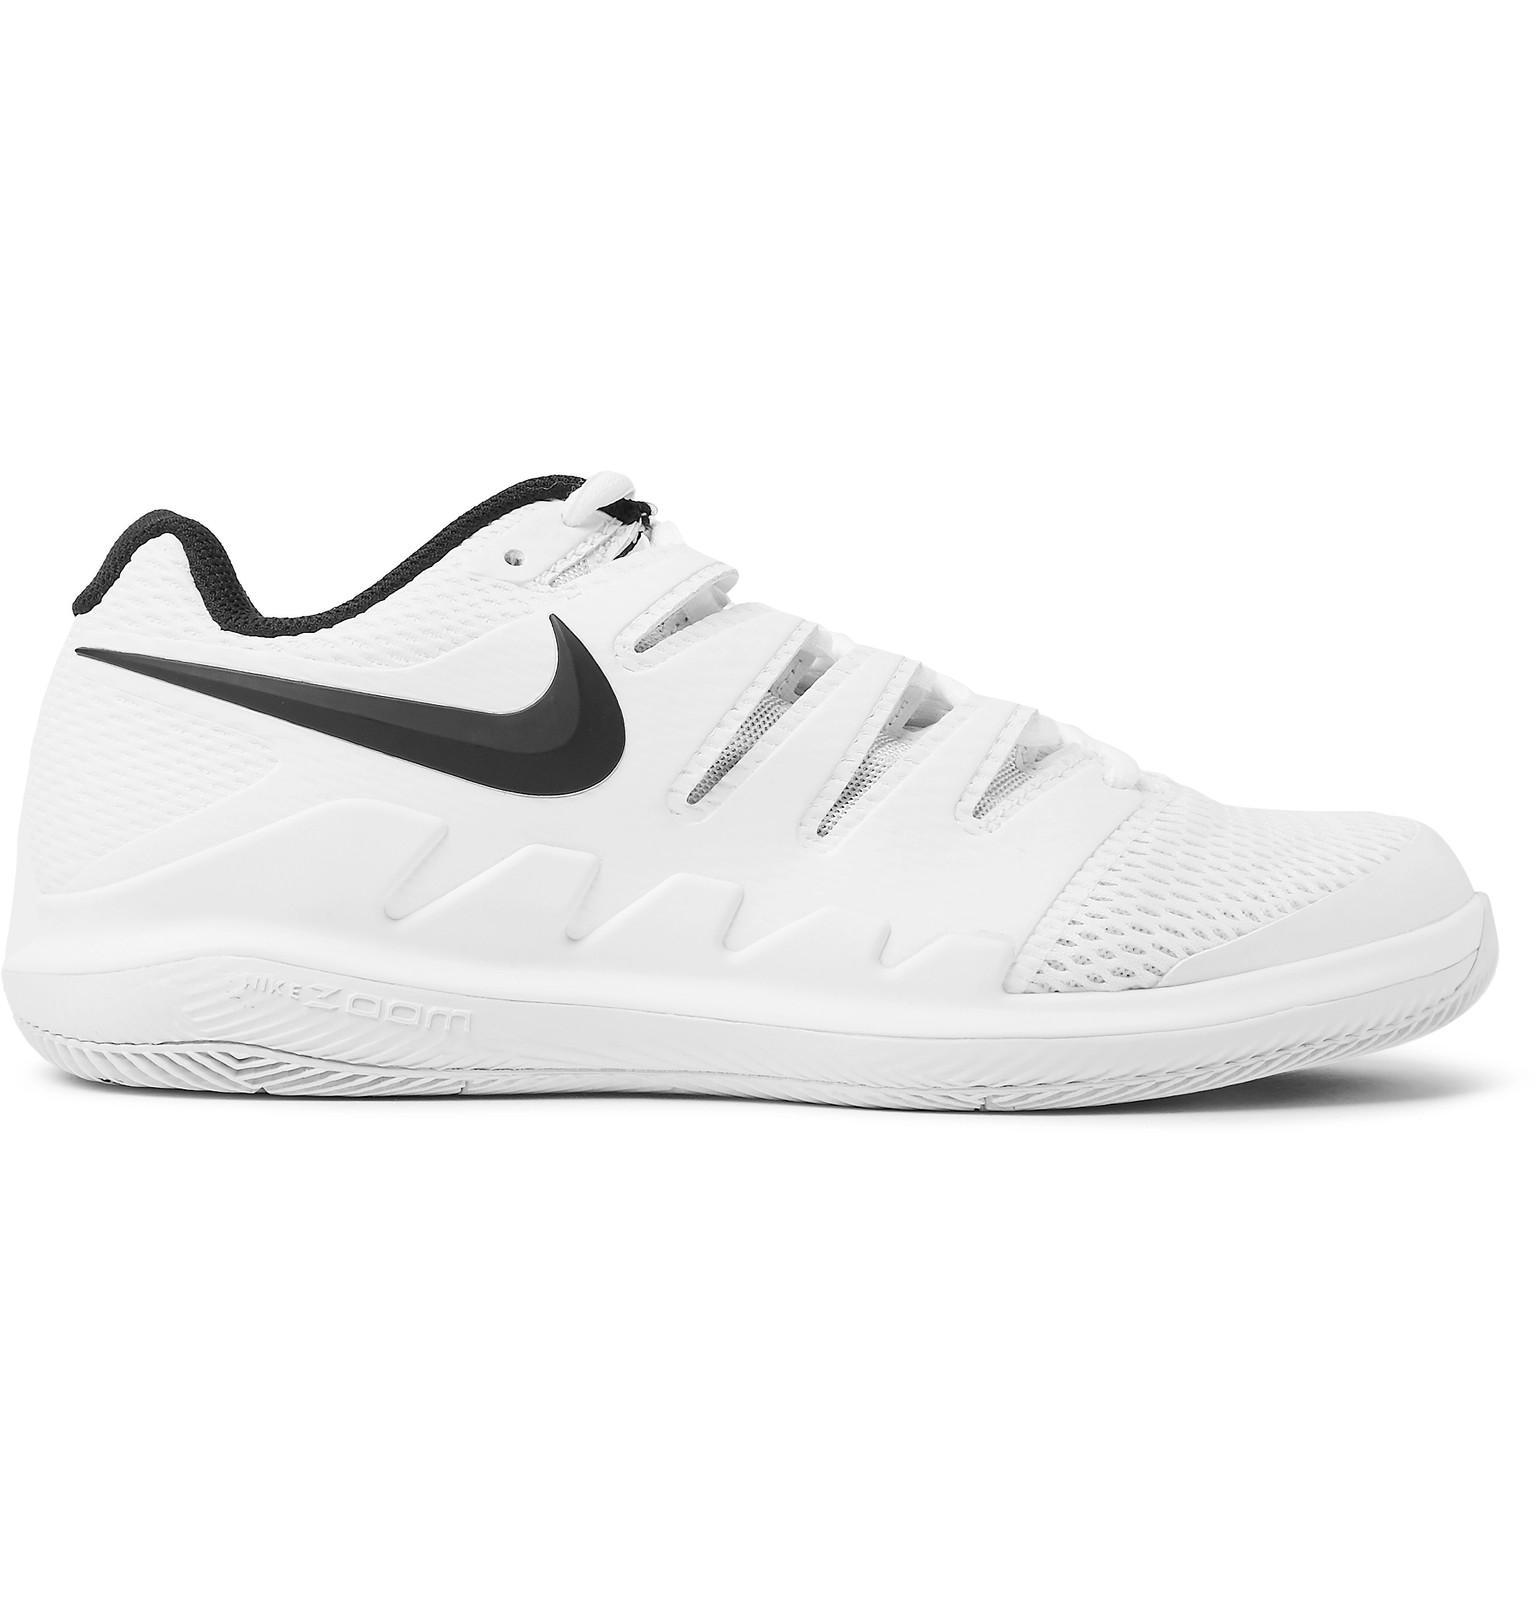 Air Zoom Prestige Rubber-trimmed Mesh Tennis Sneakers Nike vqnSX